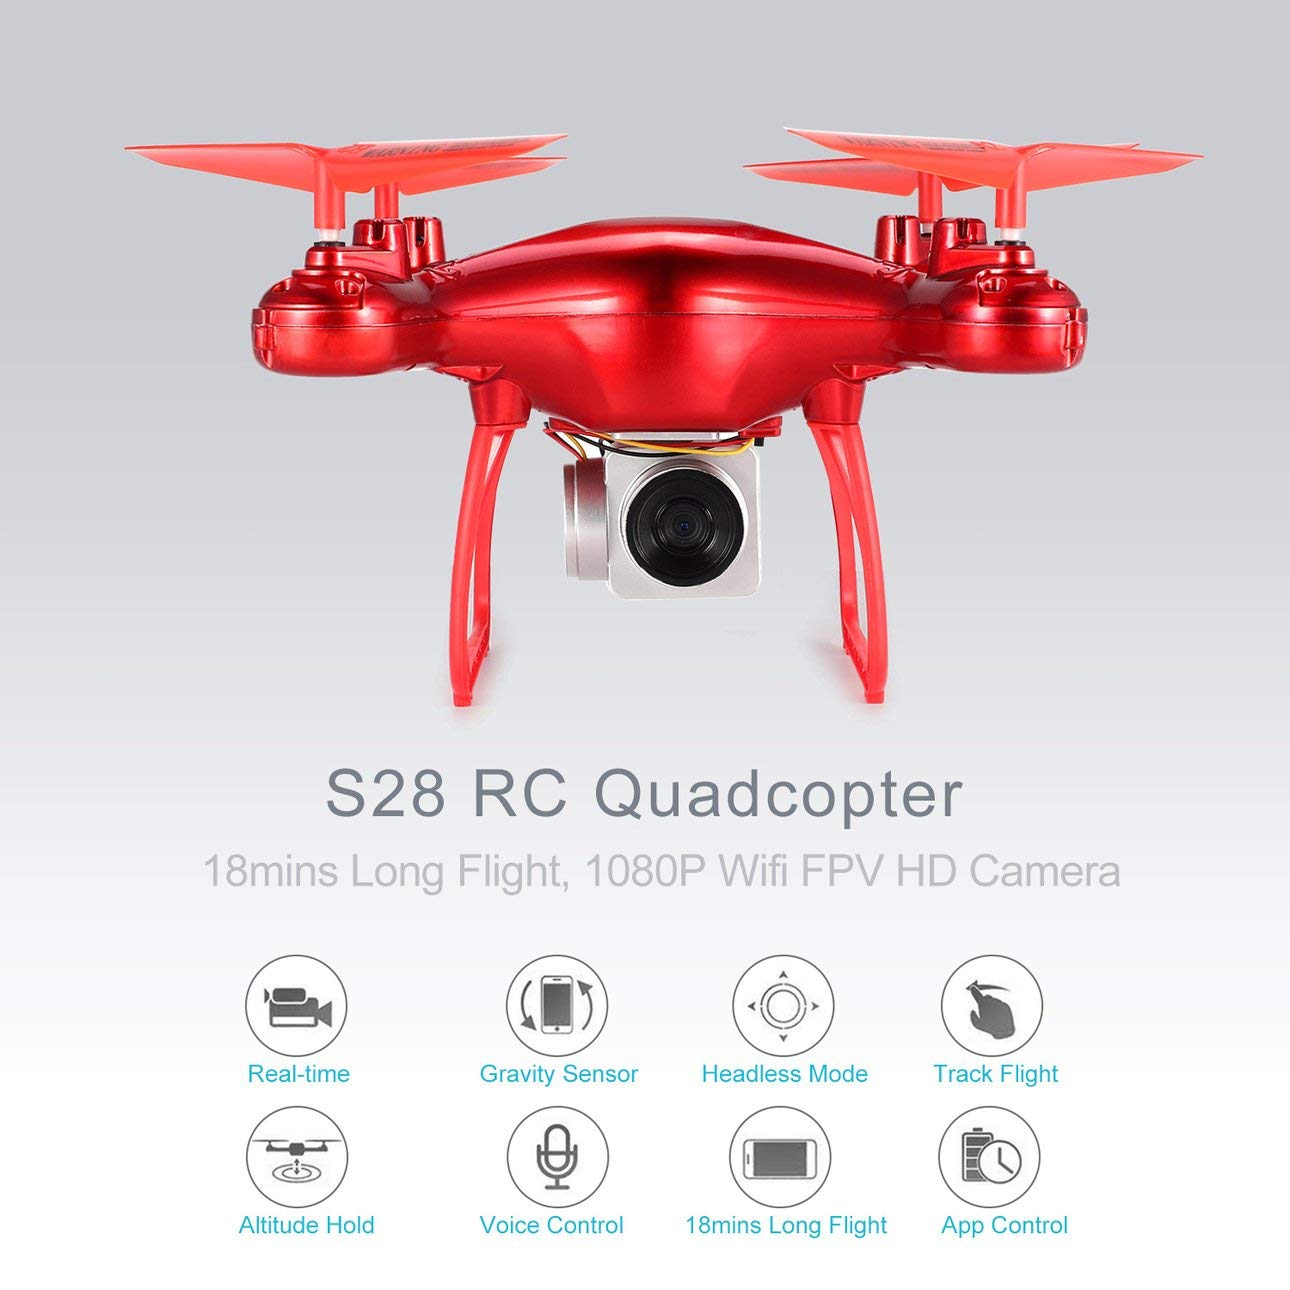 Ballylelly S28 RC Drone 2,4G Quadcopter 1080P Wifi FPV Kamera 18min Lange Flughöhe rot